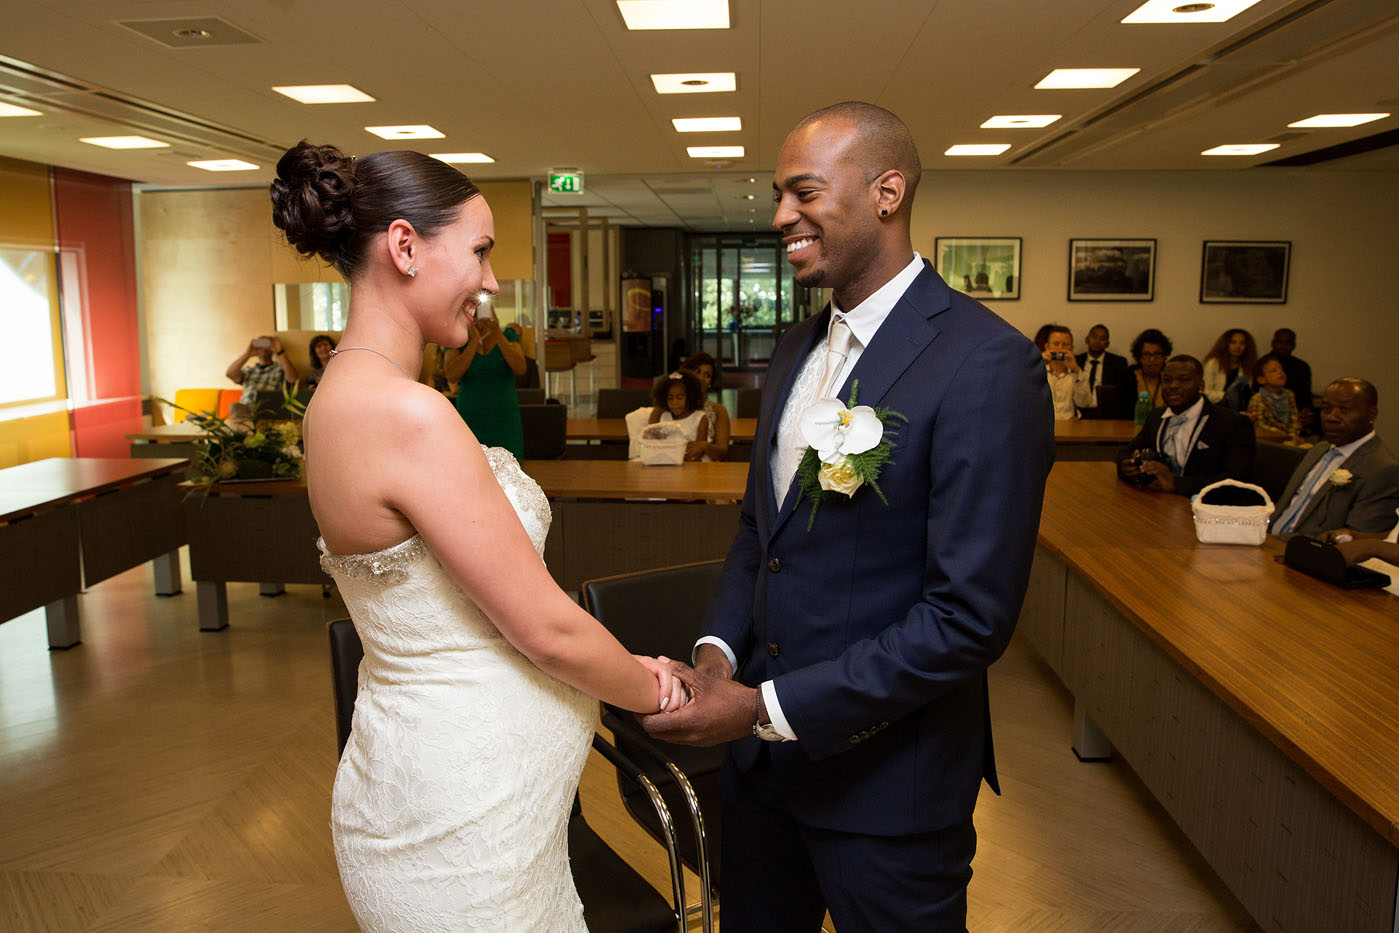 bruiloft-wedding-trouwen-rotterdam-fotograaf-bobhersbach-ja